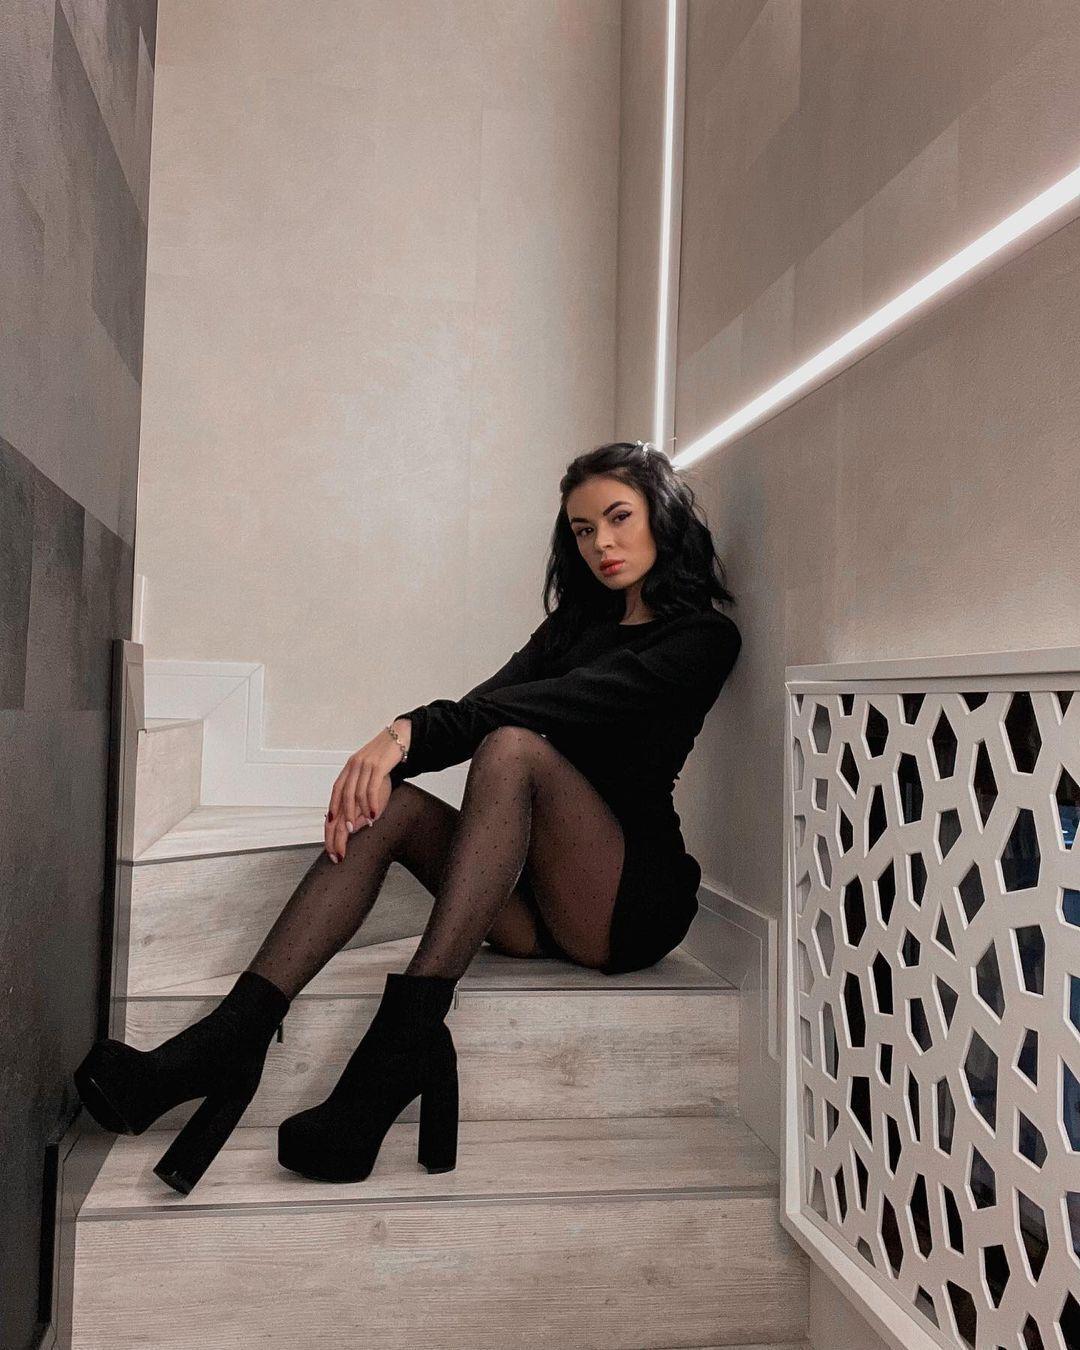 Анастасия Томазова в черном